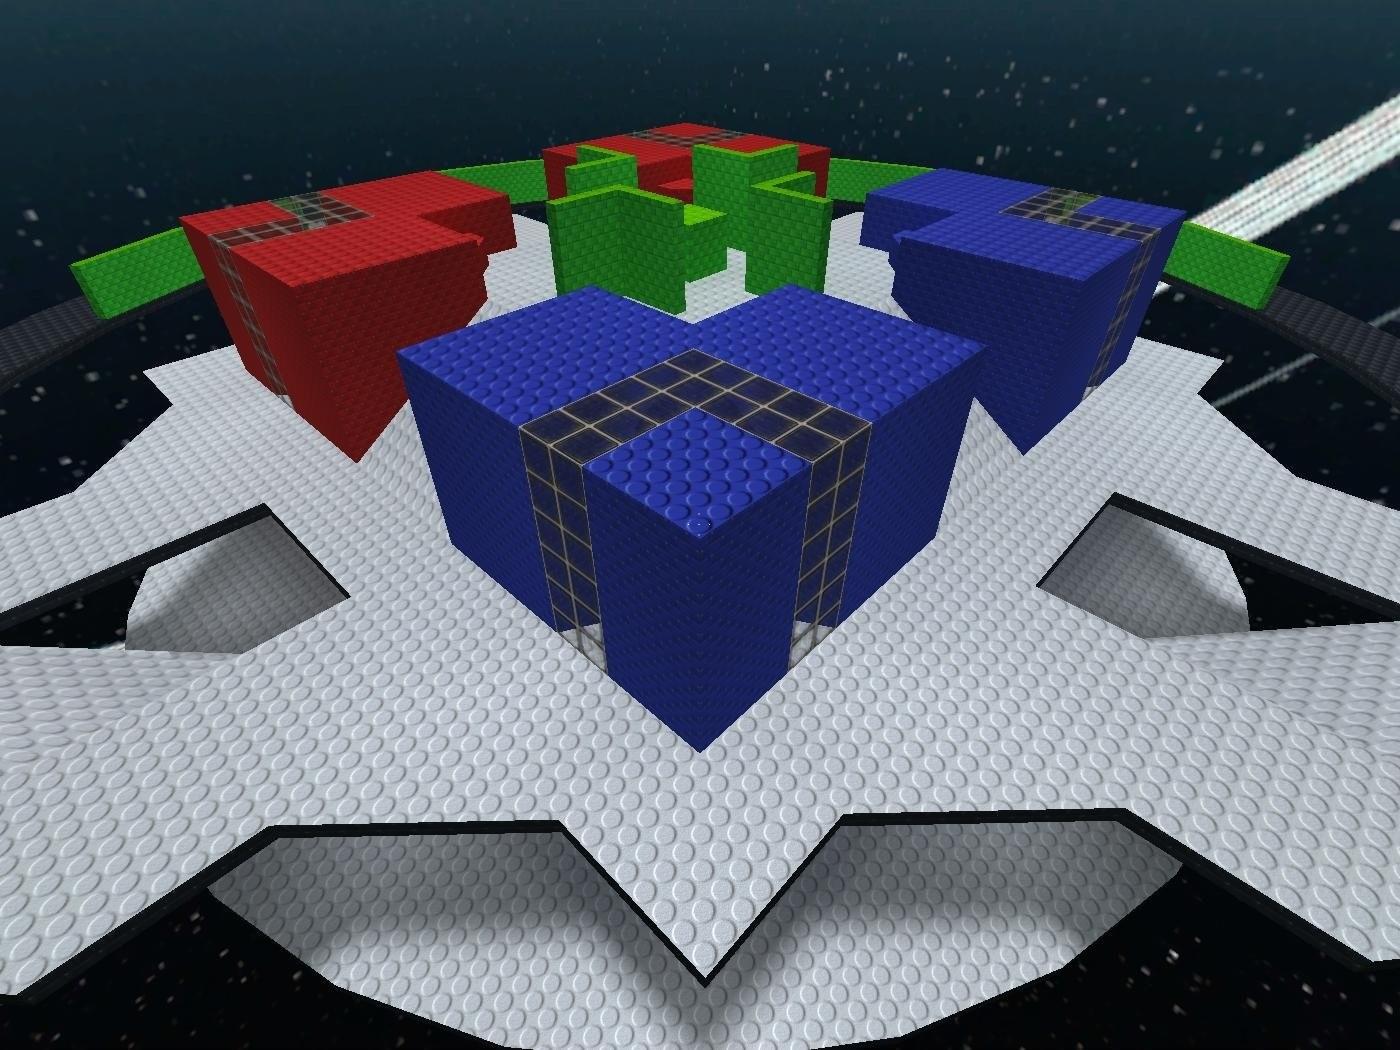 http://endgegner.fightercom.de/CounterStrikeGlobalOffensive/screen-gg_lego_spacetower22.jpg